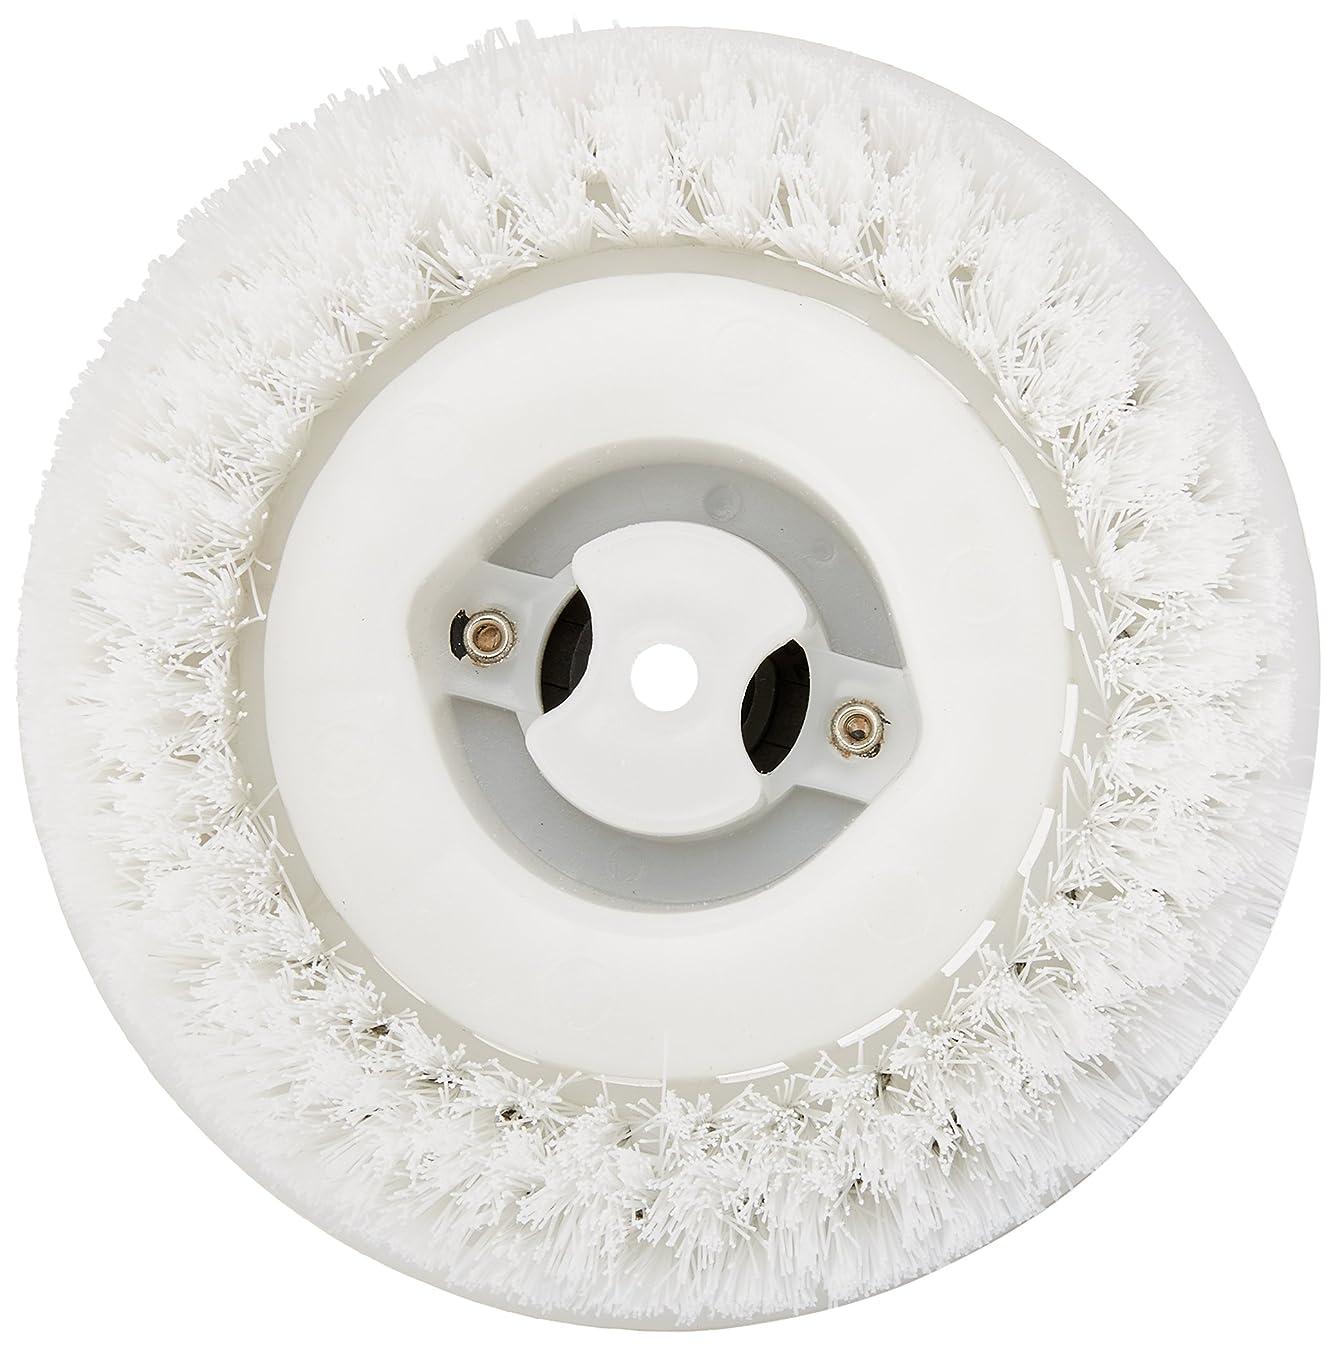 Koblenz 45-0136-7 Carpet Shampoo Brushes, 2-Pack